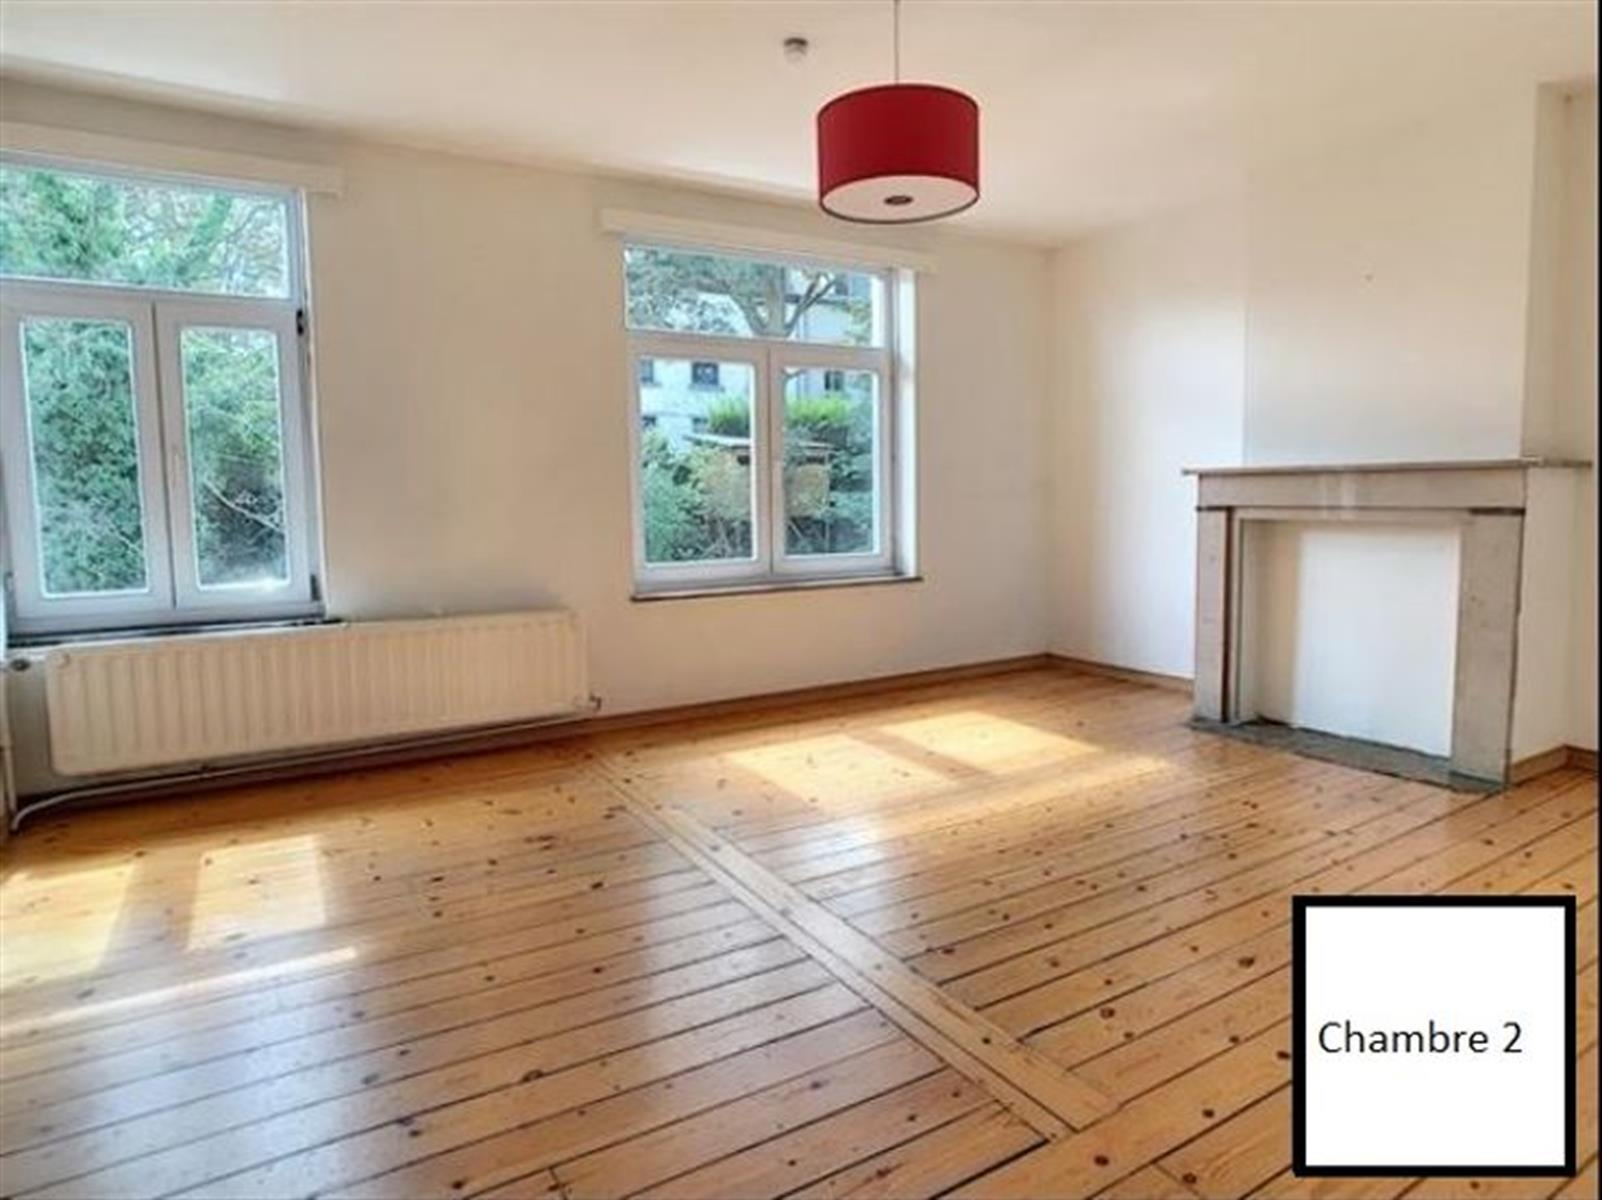 Maison - Auderghem - #4391601-2